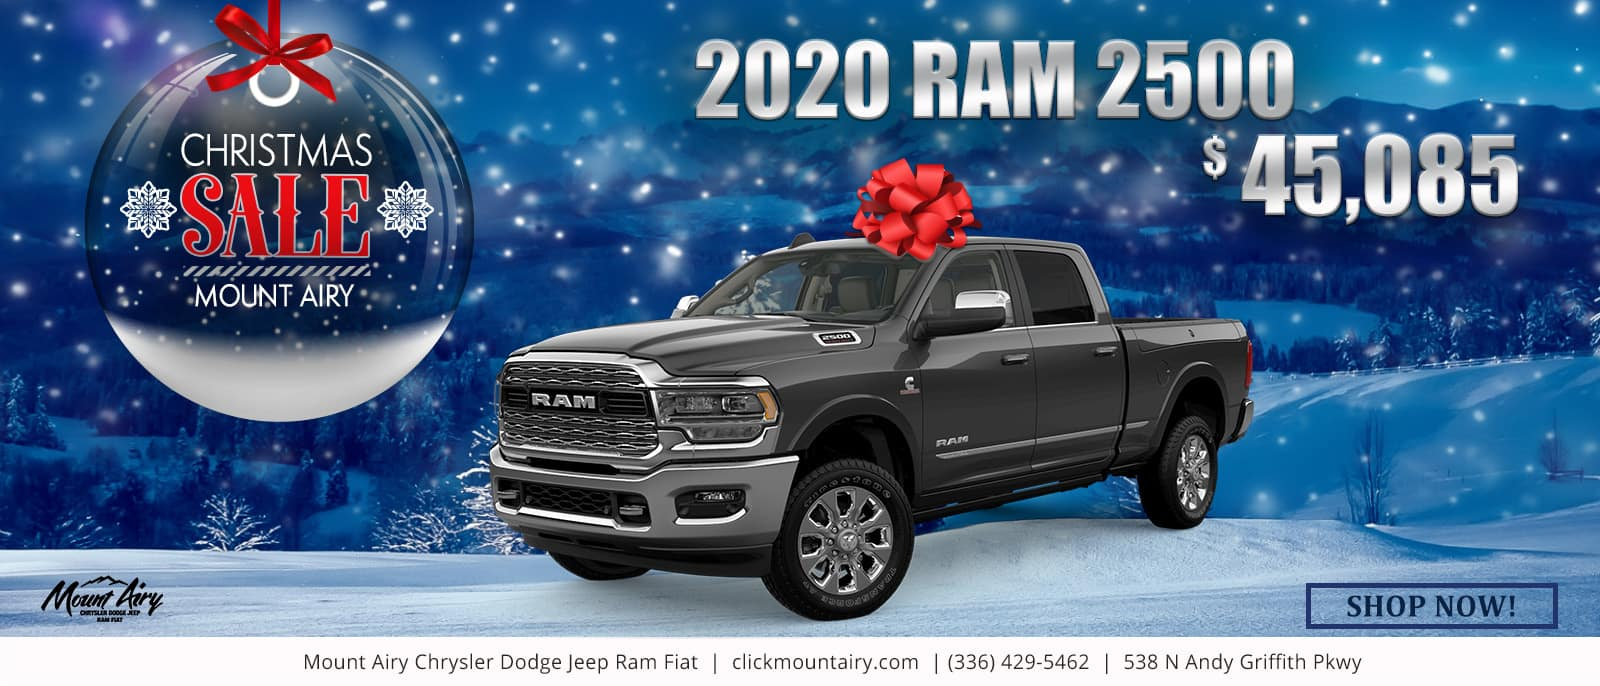 CDJRF_Nov-Dec_2020_Slider_Ram2500